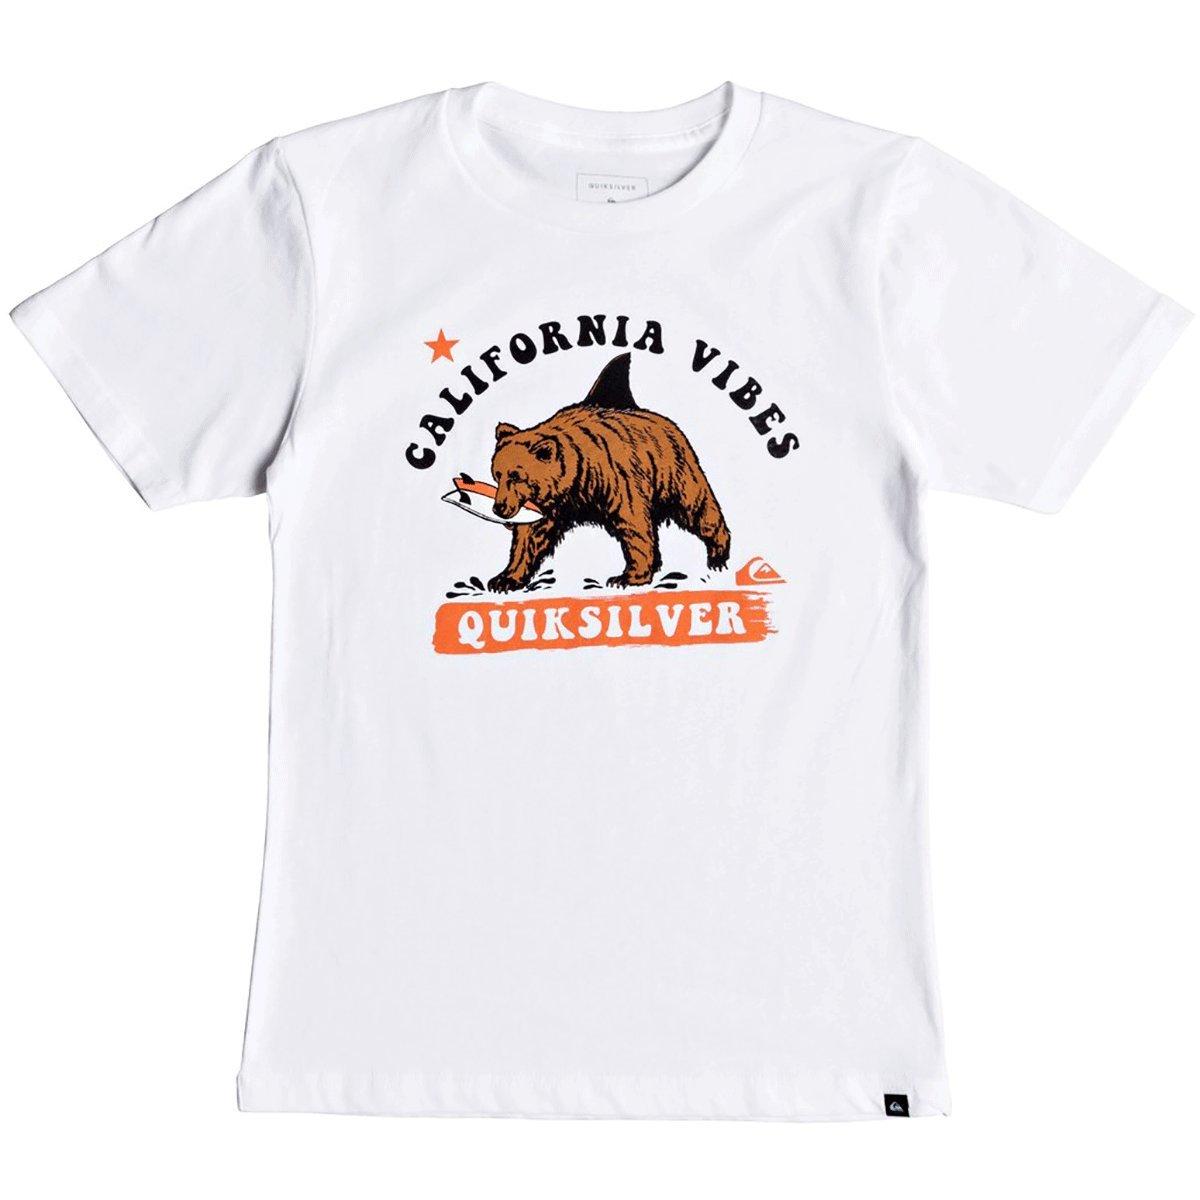 Quiksilver Boys' Big CALI Bear Shark Youth TEE Shirt, Black, L/14